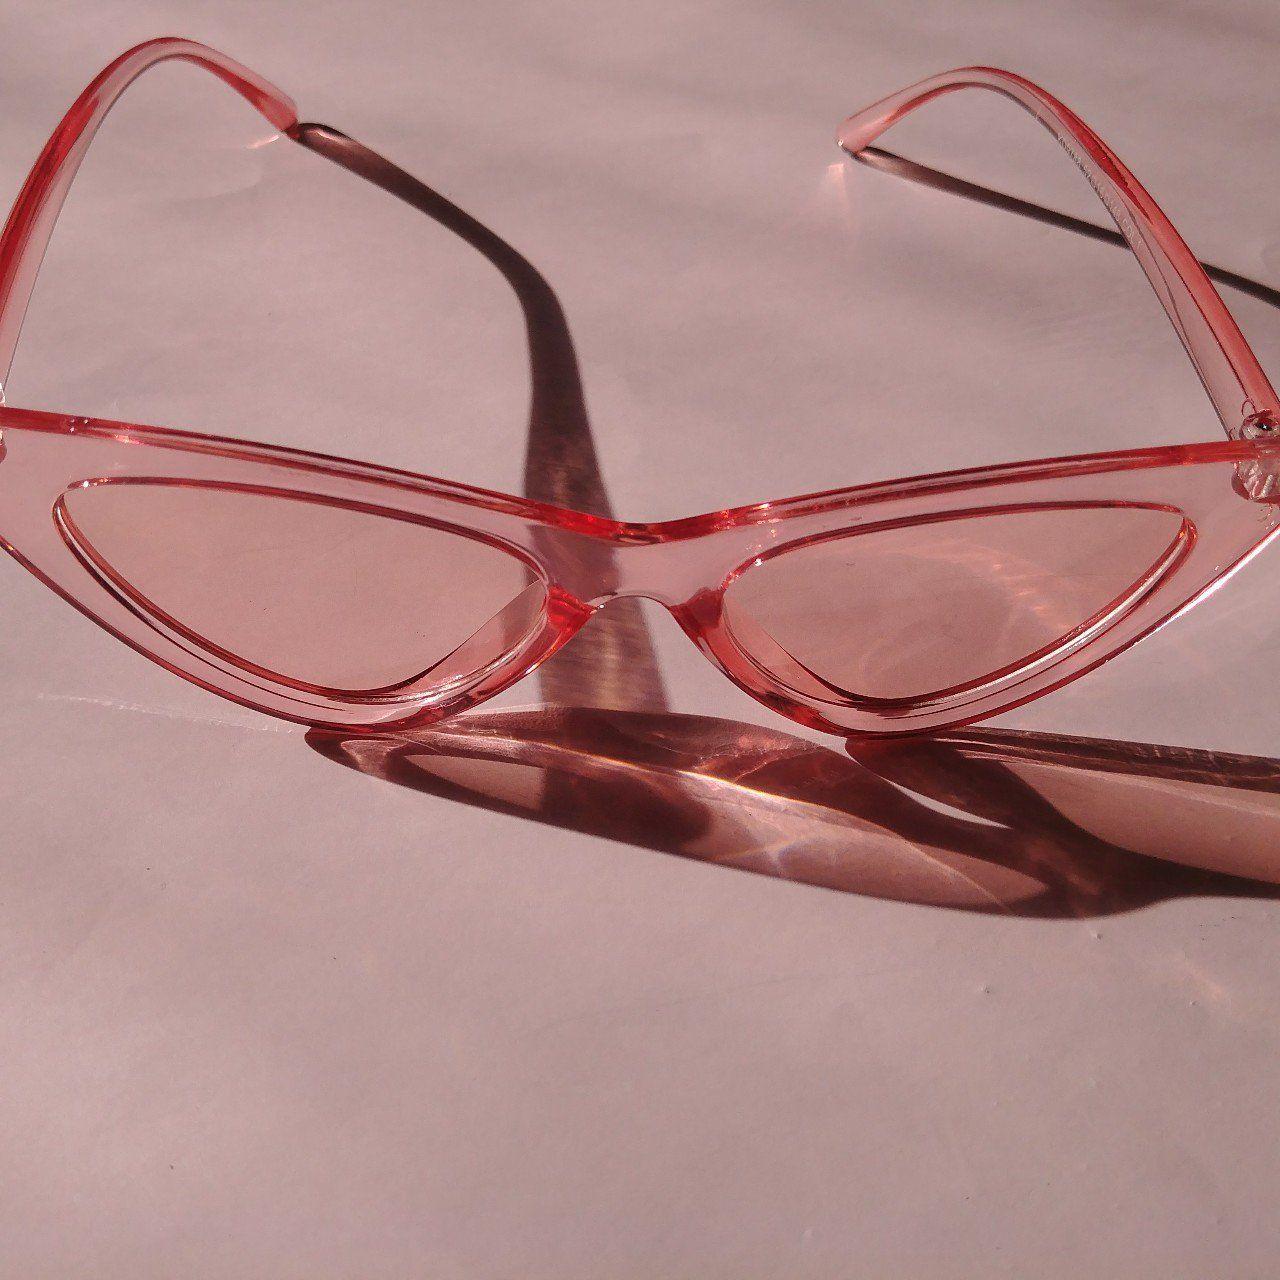 4e1a72f78eaaf Pink transparent cat eye shades Brand new  sunglasses - Depop